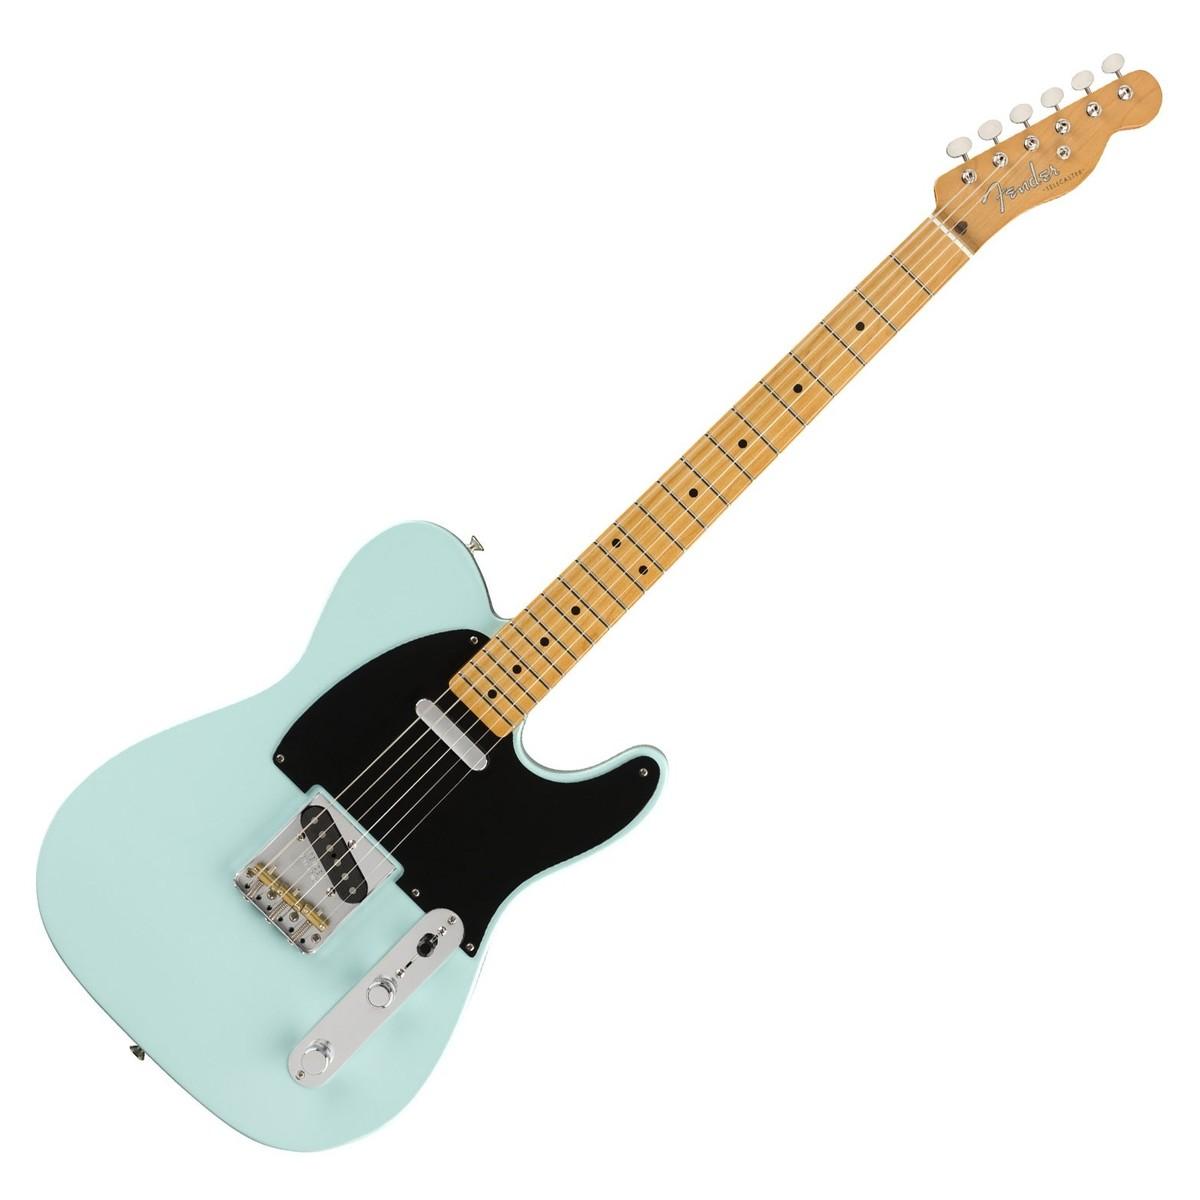 fender vintera series 50s mod telecaster mn daphne blue guitar mania. Black Bedroom Furniture Sets. Home Design Ideas